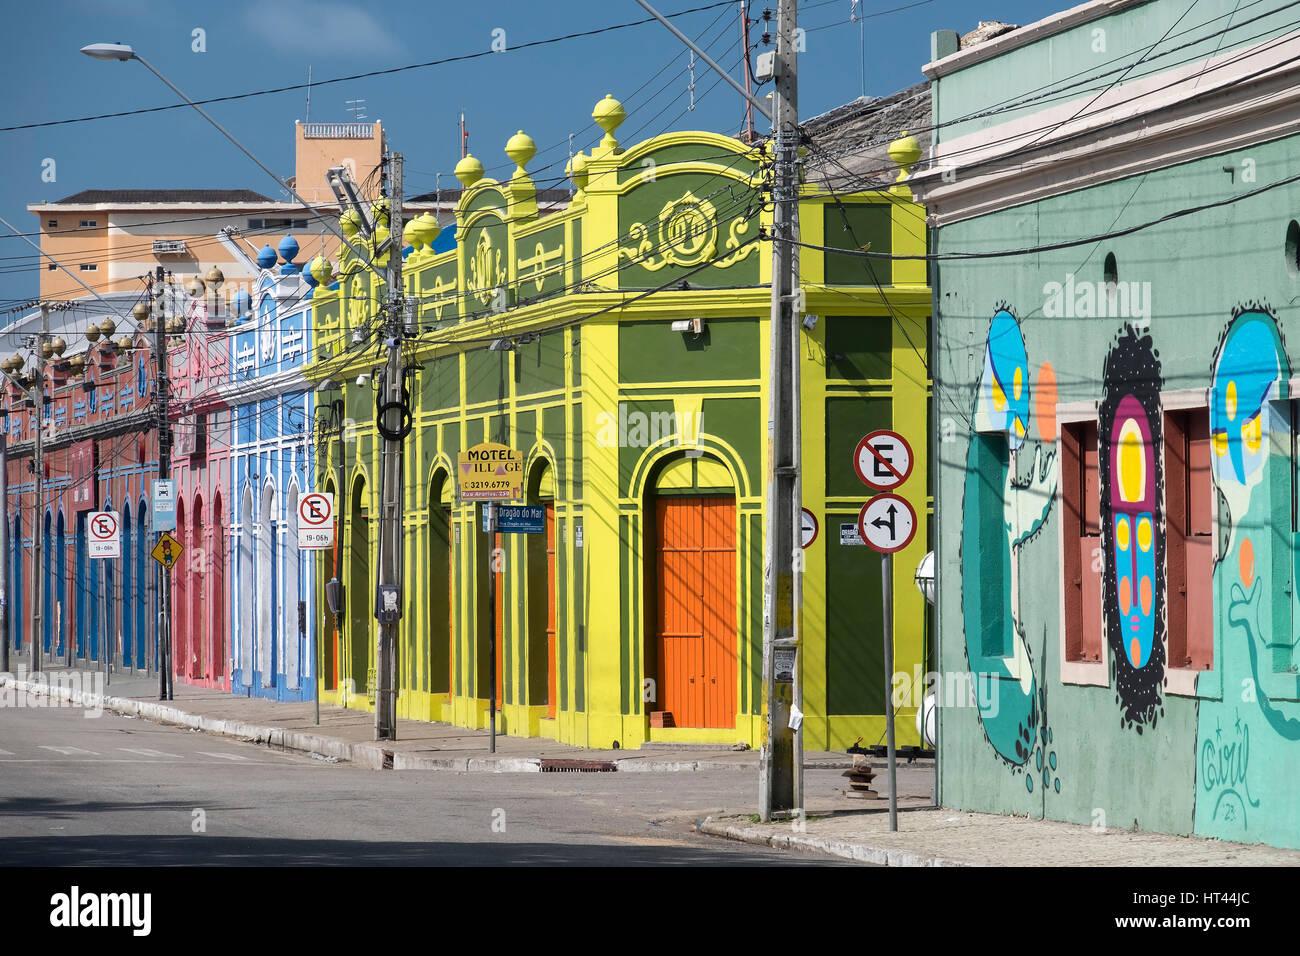 Colourful Buildings on Street Rua Almirante Jaceguai, Fortaleza, State of Ceara, Brazil, South America - Stock Image